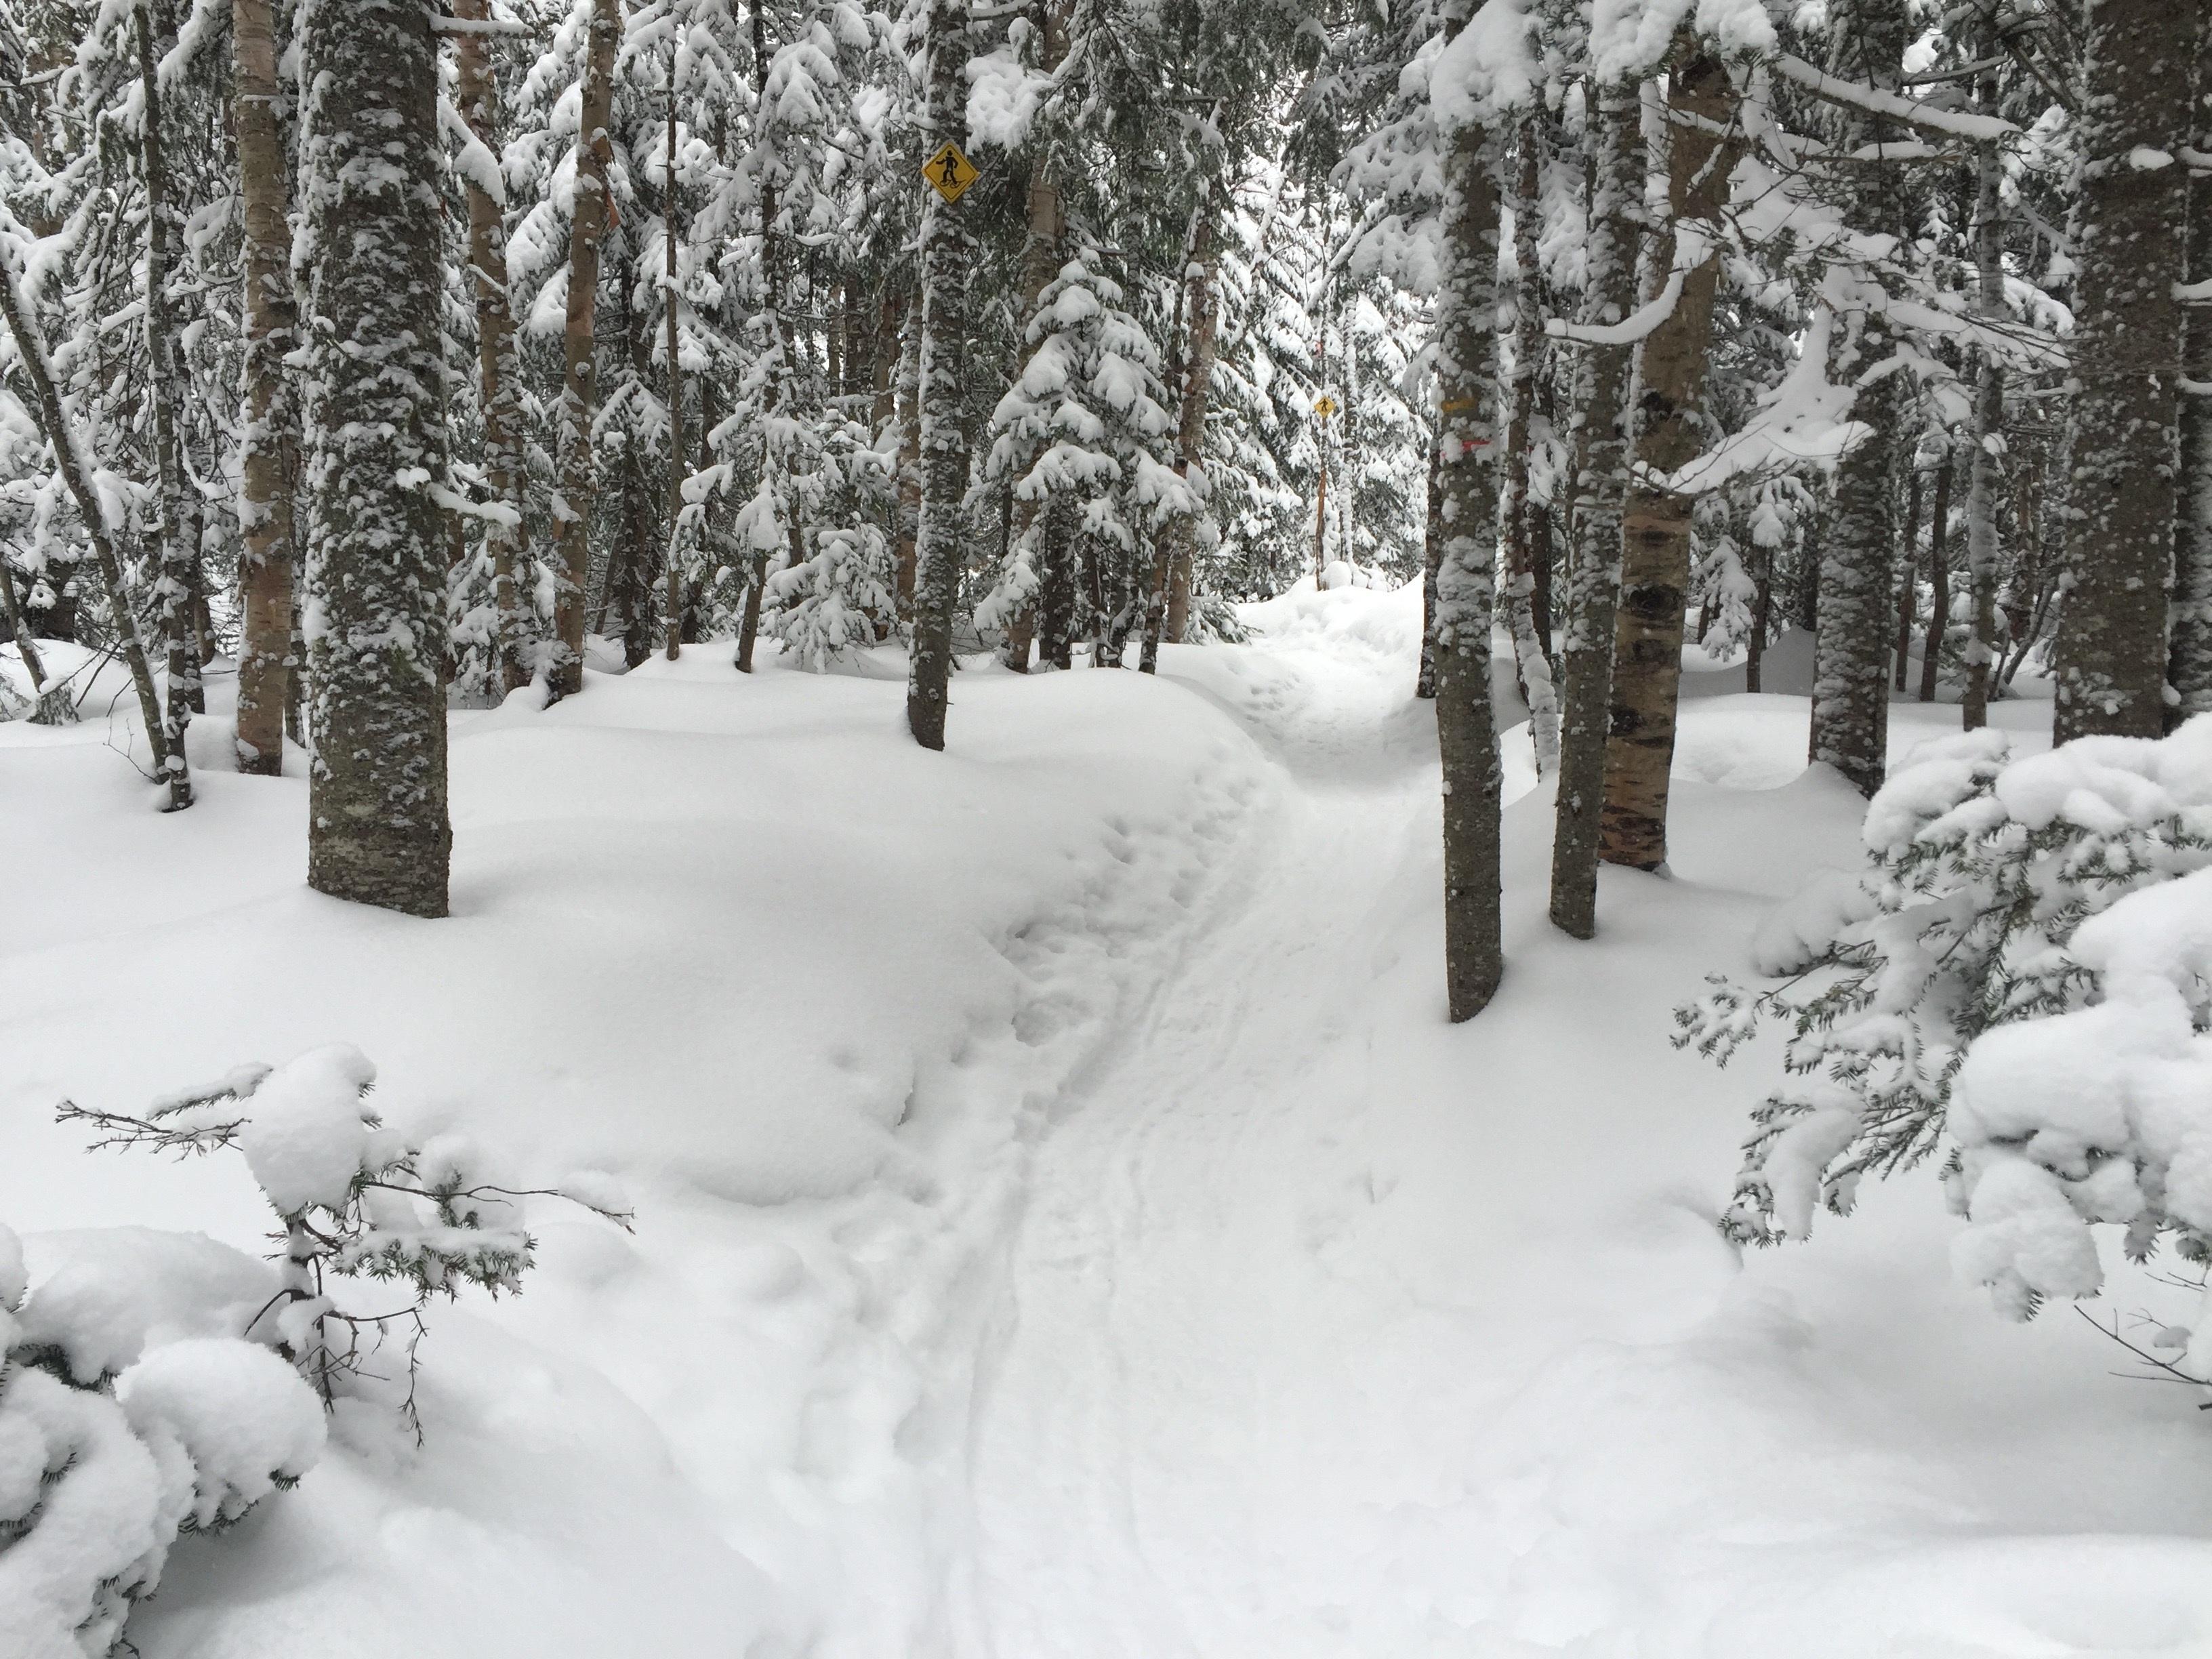 снежная тропинка фото зимние течением